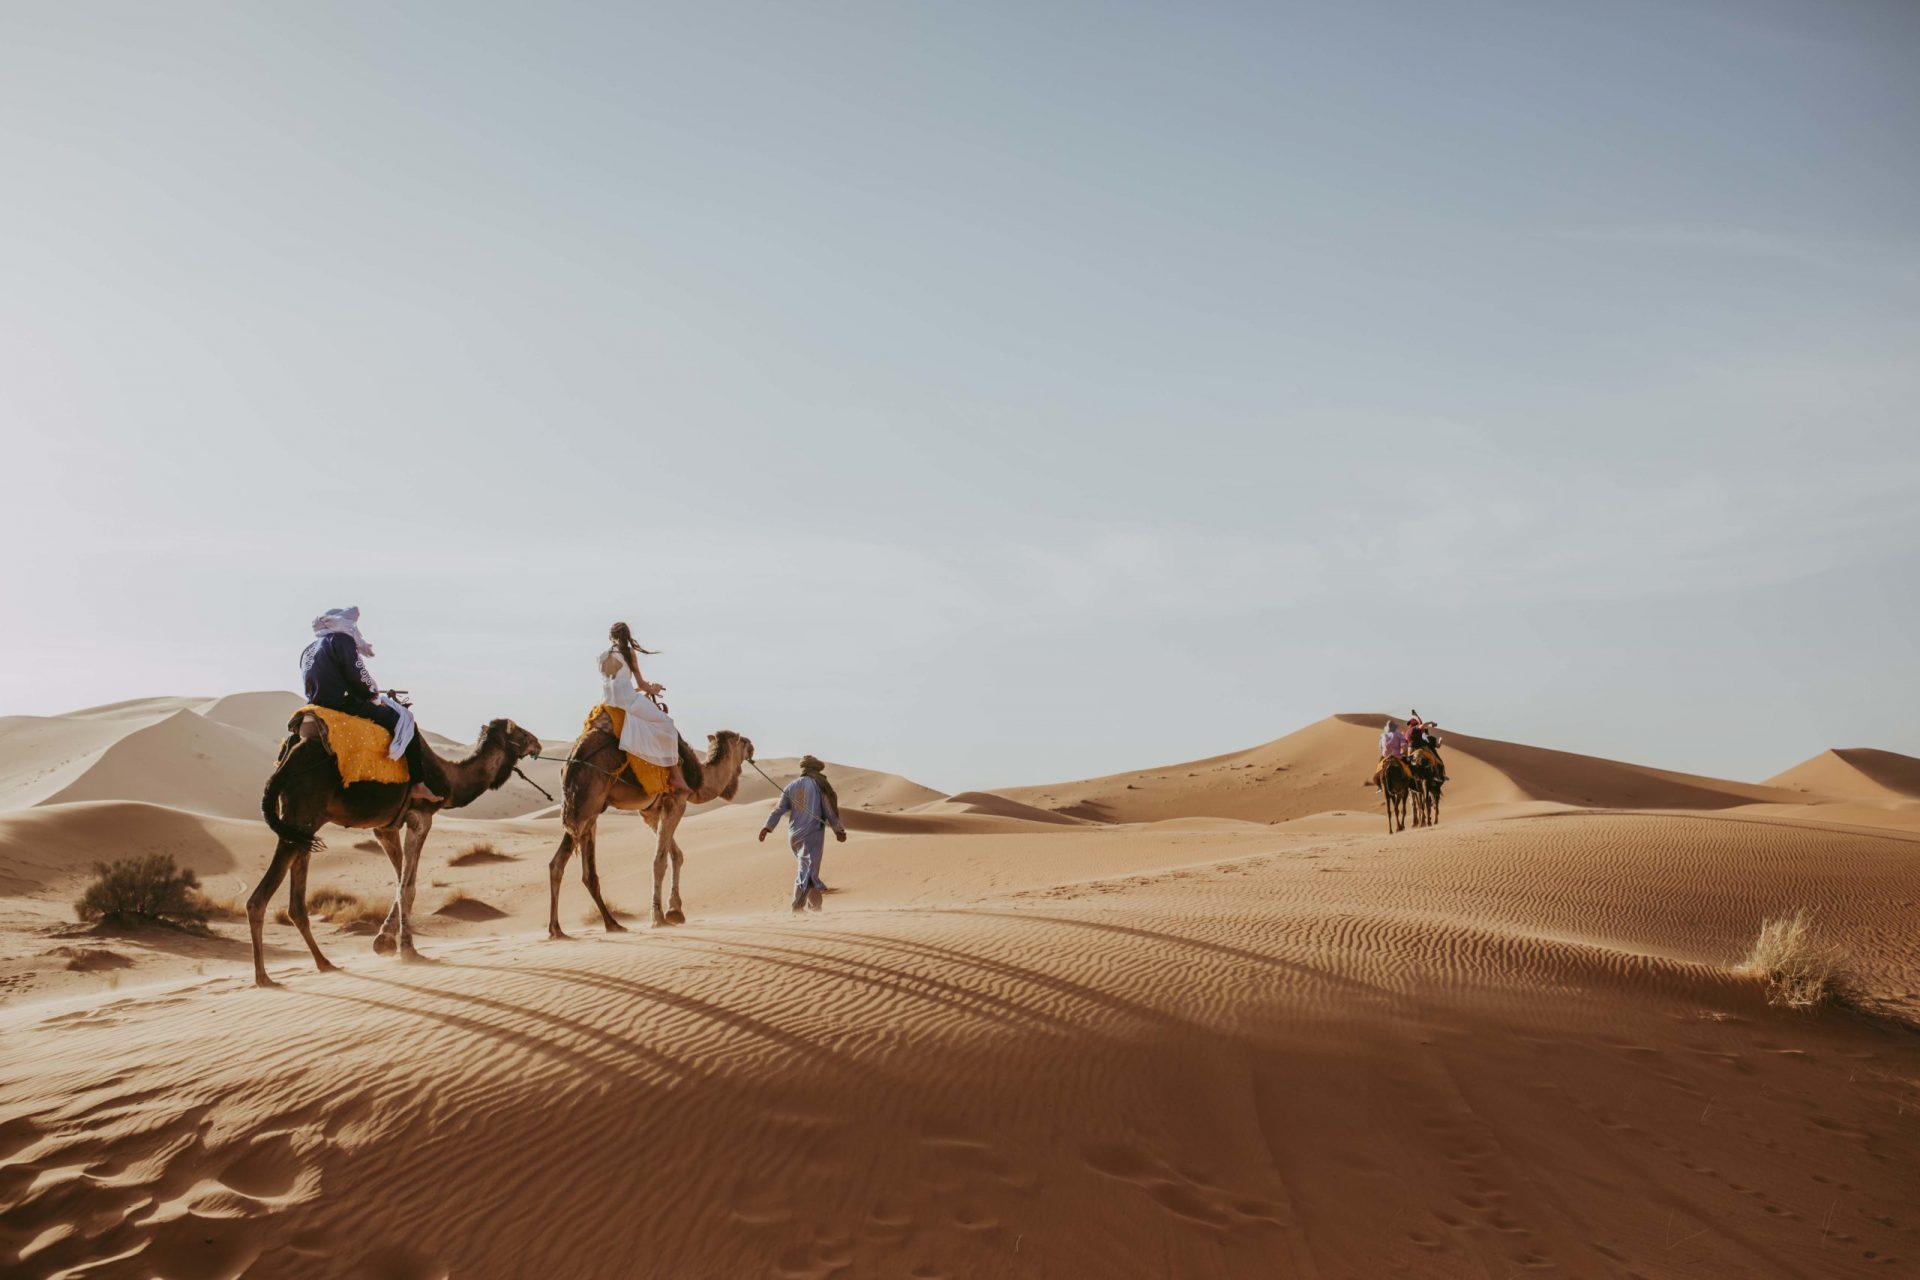 Kamkam Dunes